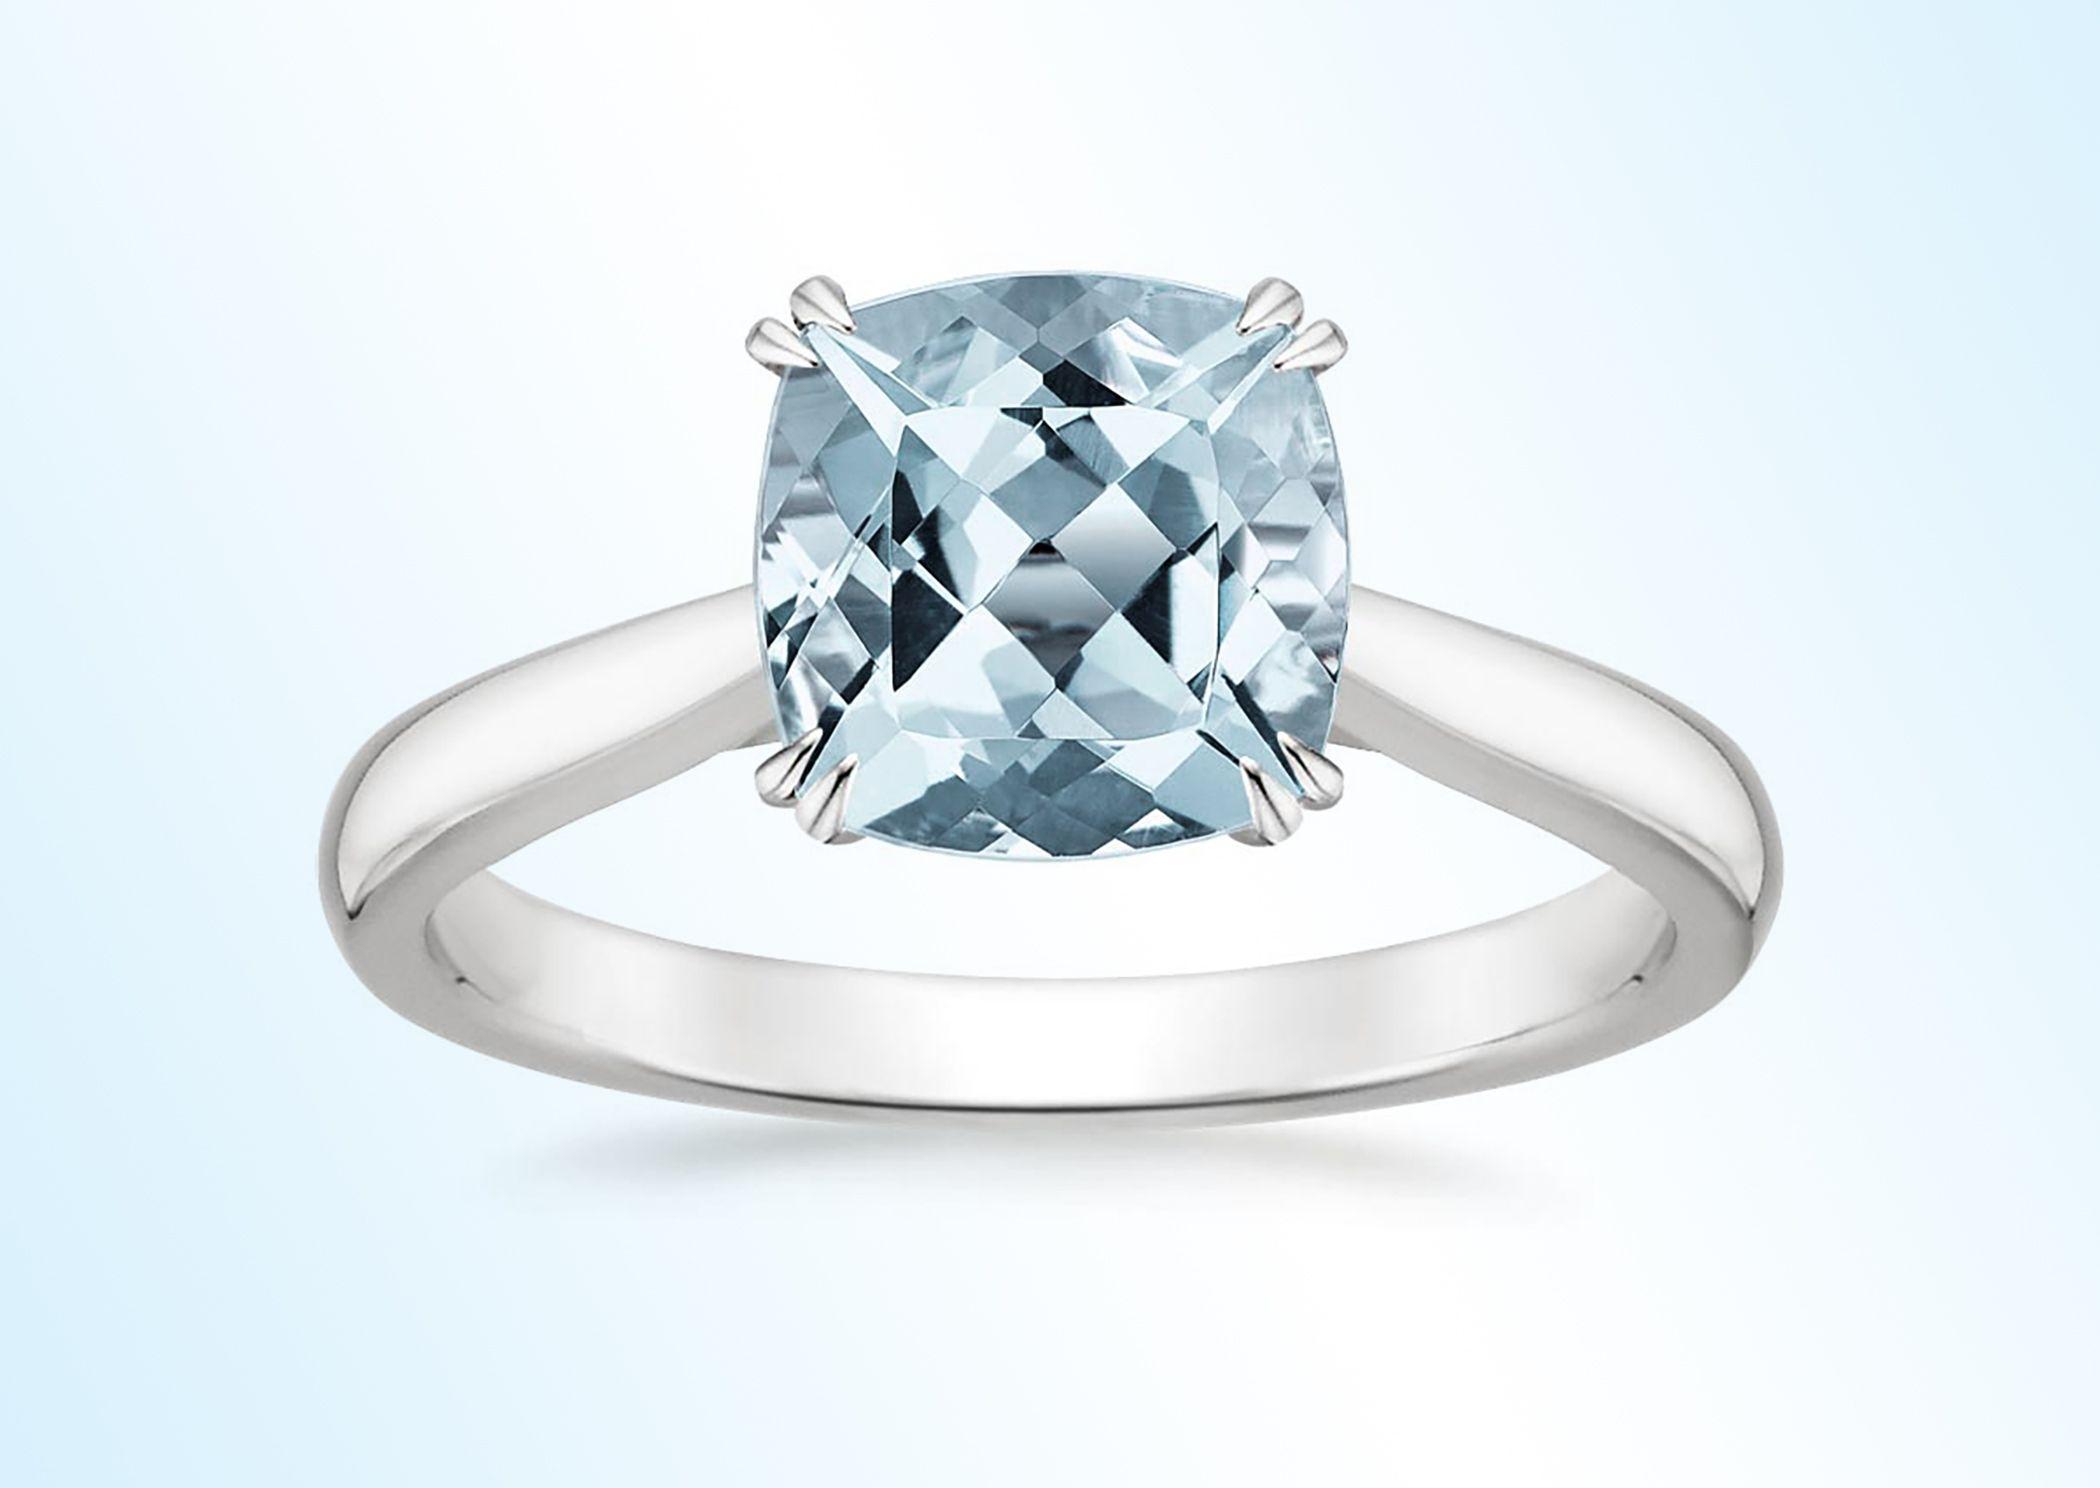 7 Classy Alternatives to Expensive Diamond Engagement